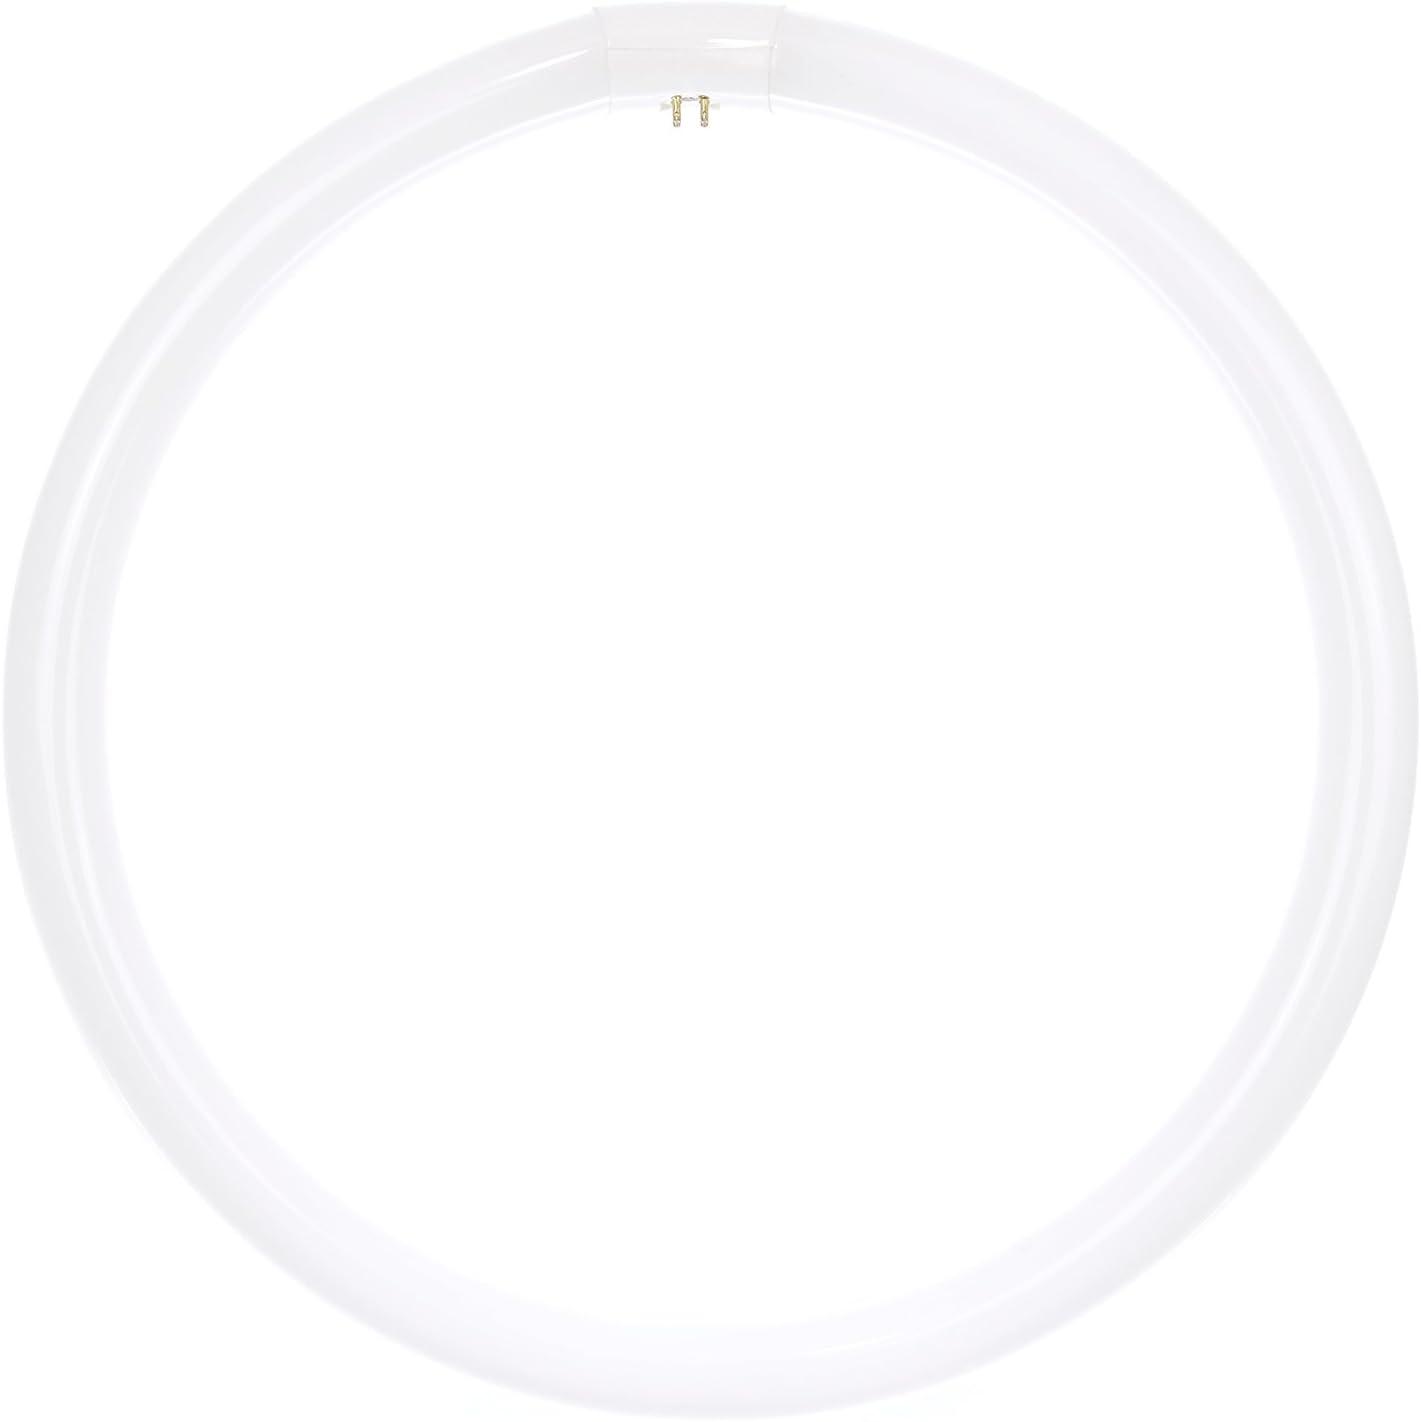 Sunlite FC16T9/CW 40W 05021 Fluorescent T9 Crcline Ceiling Light Bulb, 2600 Lumens, G10q 4-Pin Base, 40 Watts (16-Inch), Cool White